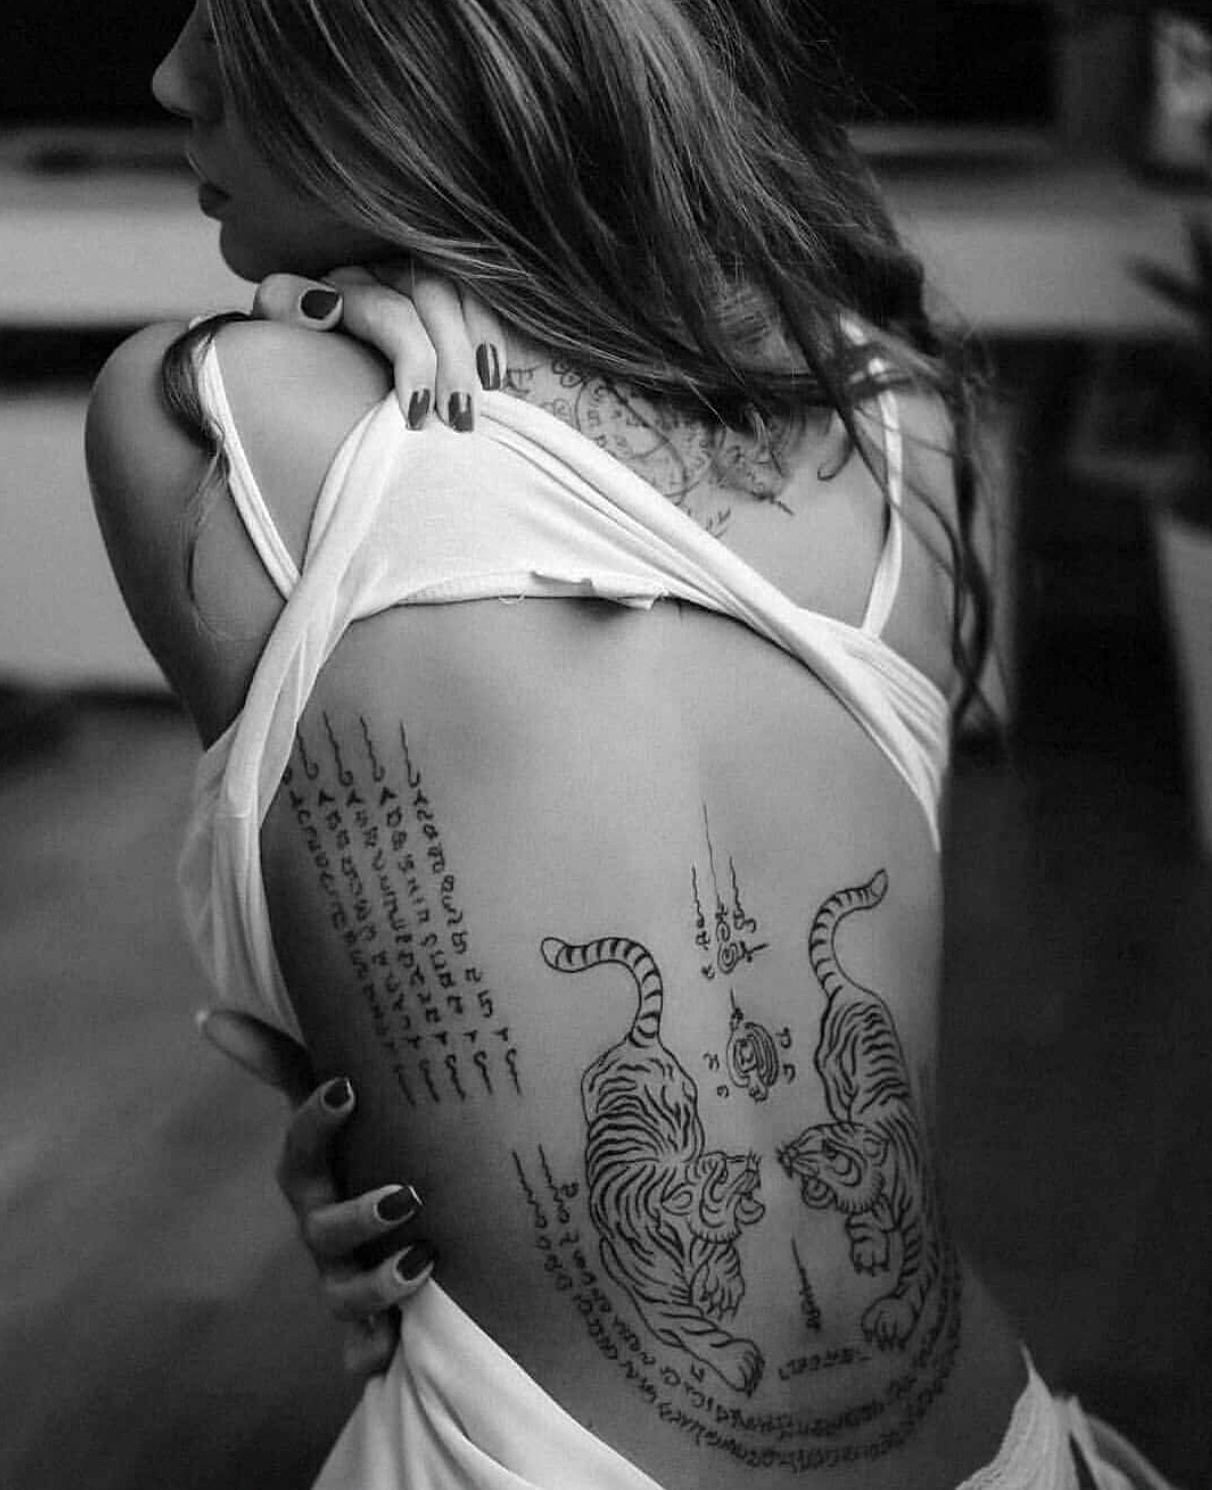 Photo of sExY TattOO, tattoo, tattooed babes, inked girls, ink, tatouage, iPhriscoTattoo #tattoosforgirls